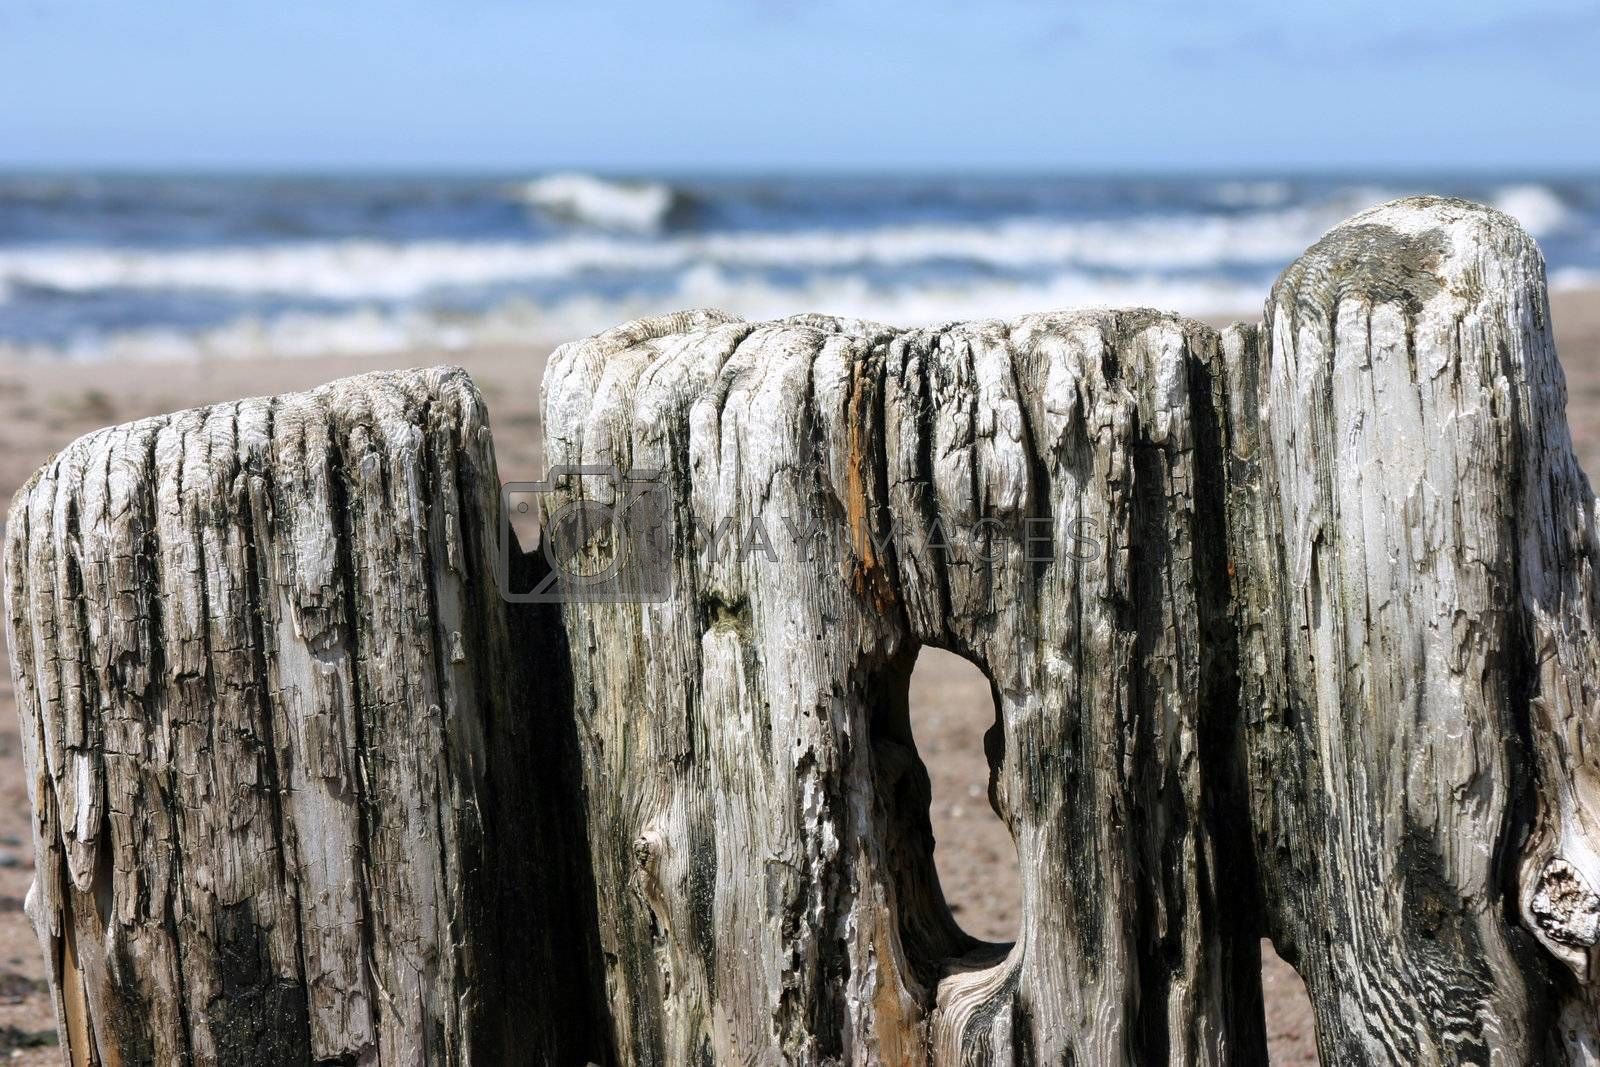 Rotten piles on the seashore, empty Baltic sea beach, natural beauty